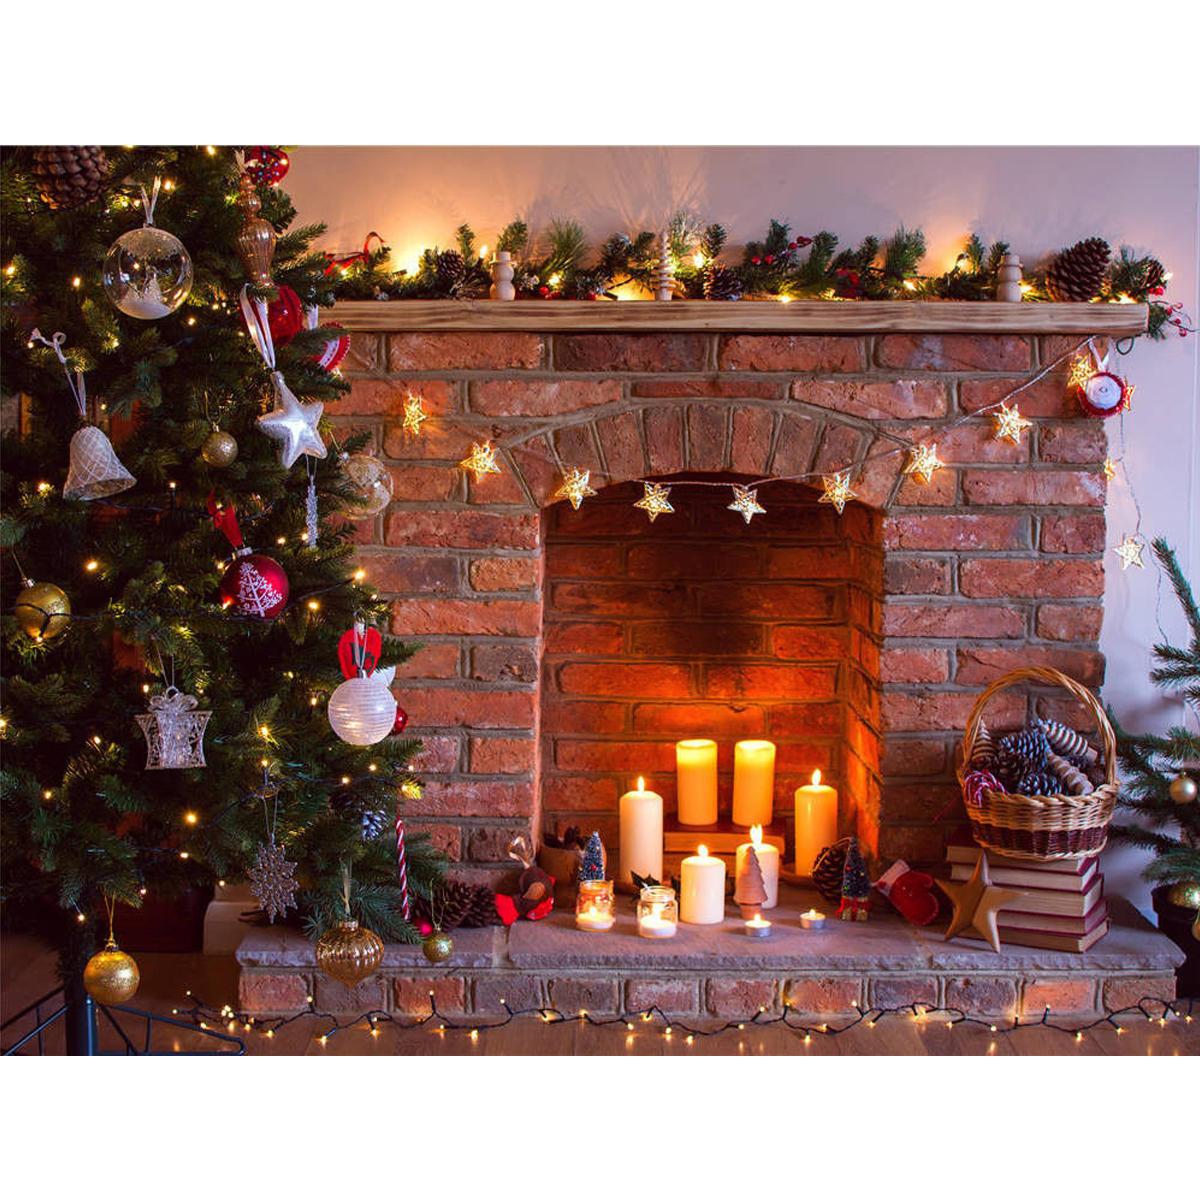 Fireplace Christmas Background  7x5ft vinyl retro christmas tree fireplace photography